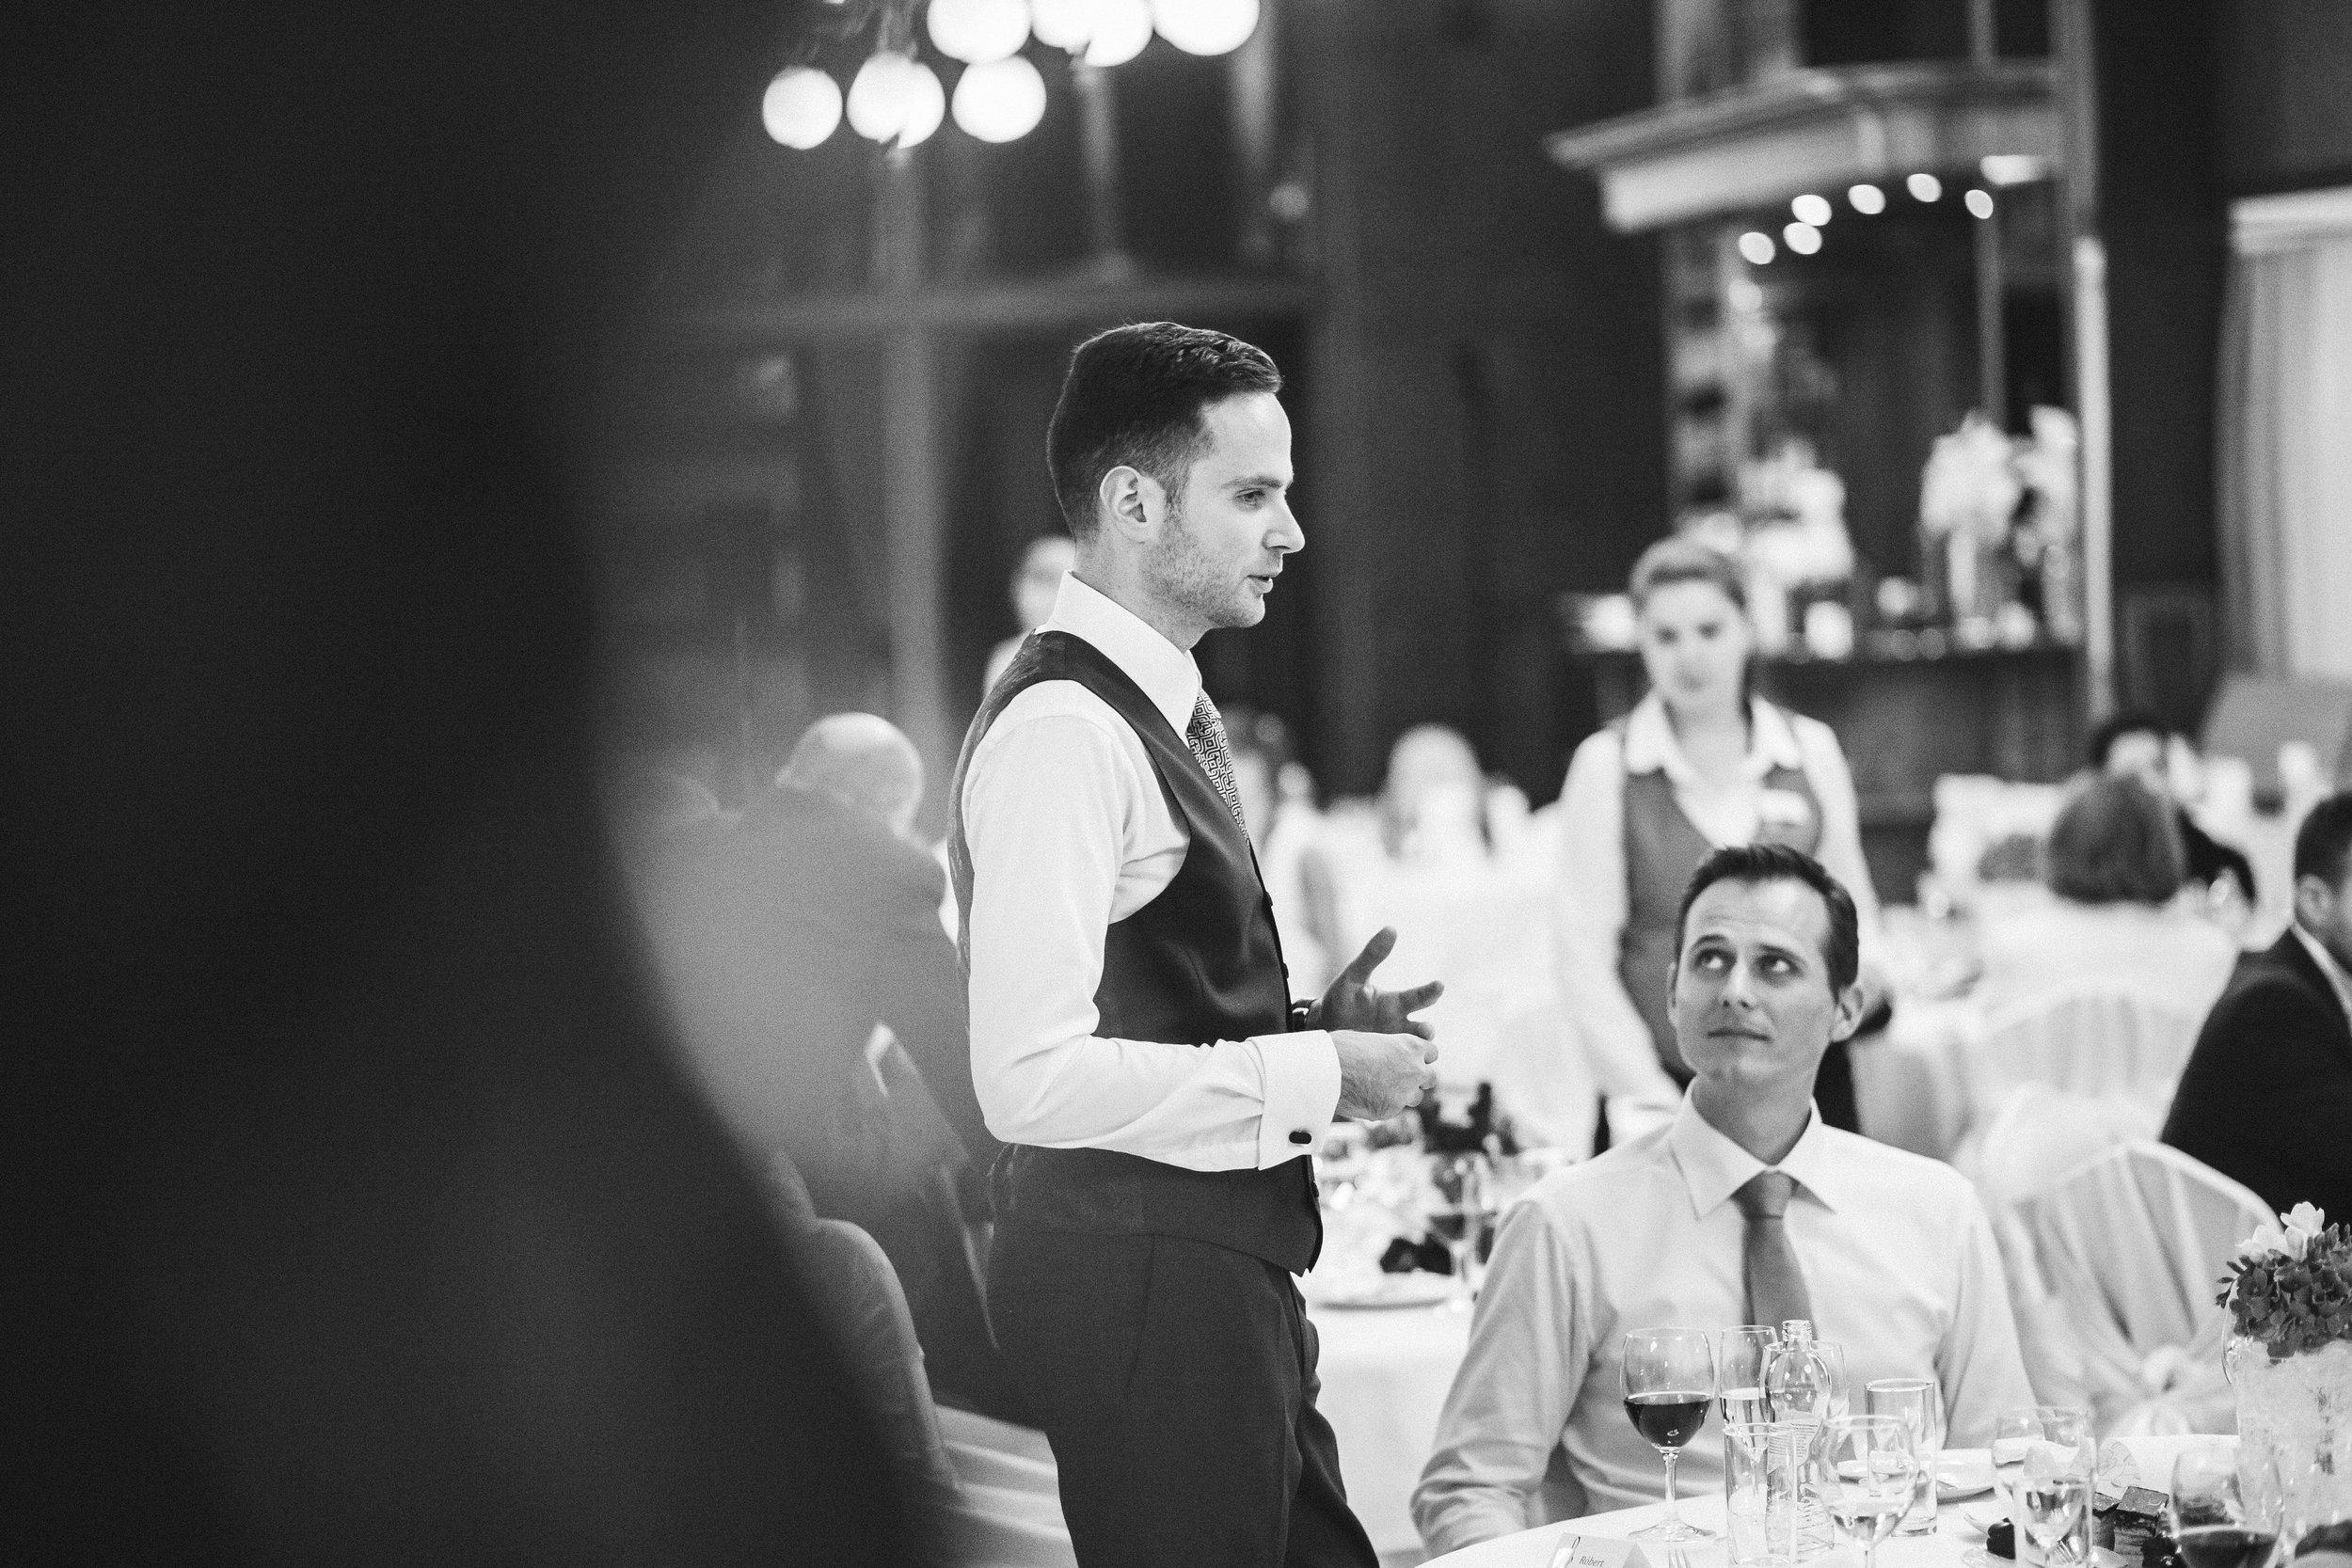 destination-wedding-photographer-slovakia-bratislava-bw-groom-documentary-style-1.jpg